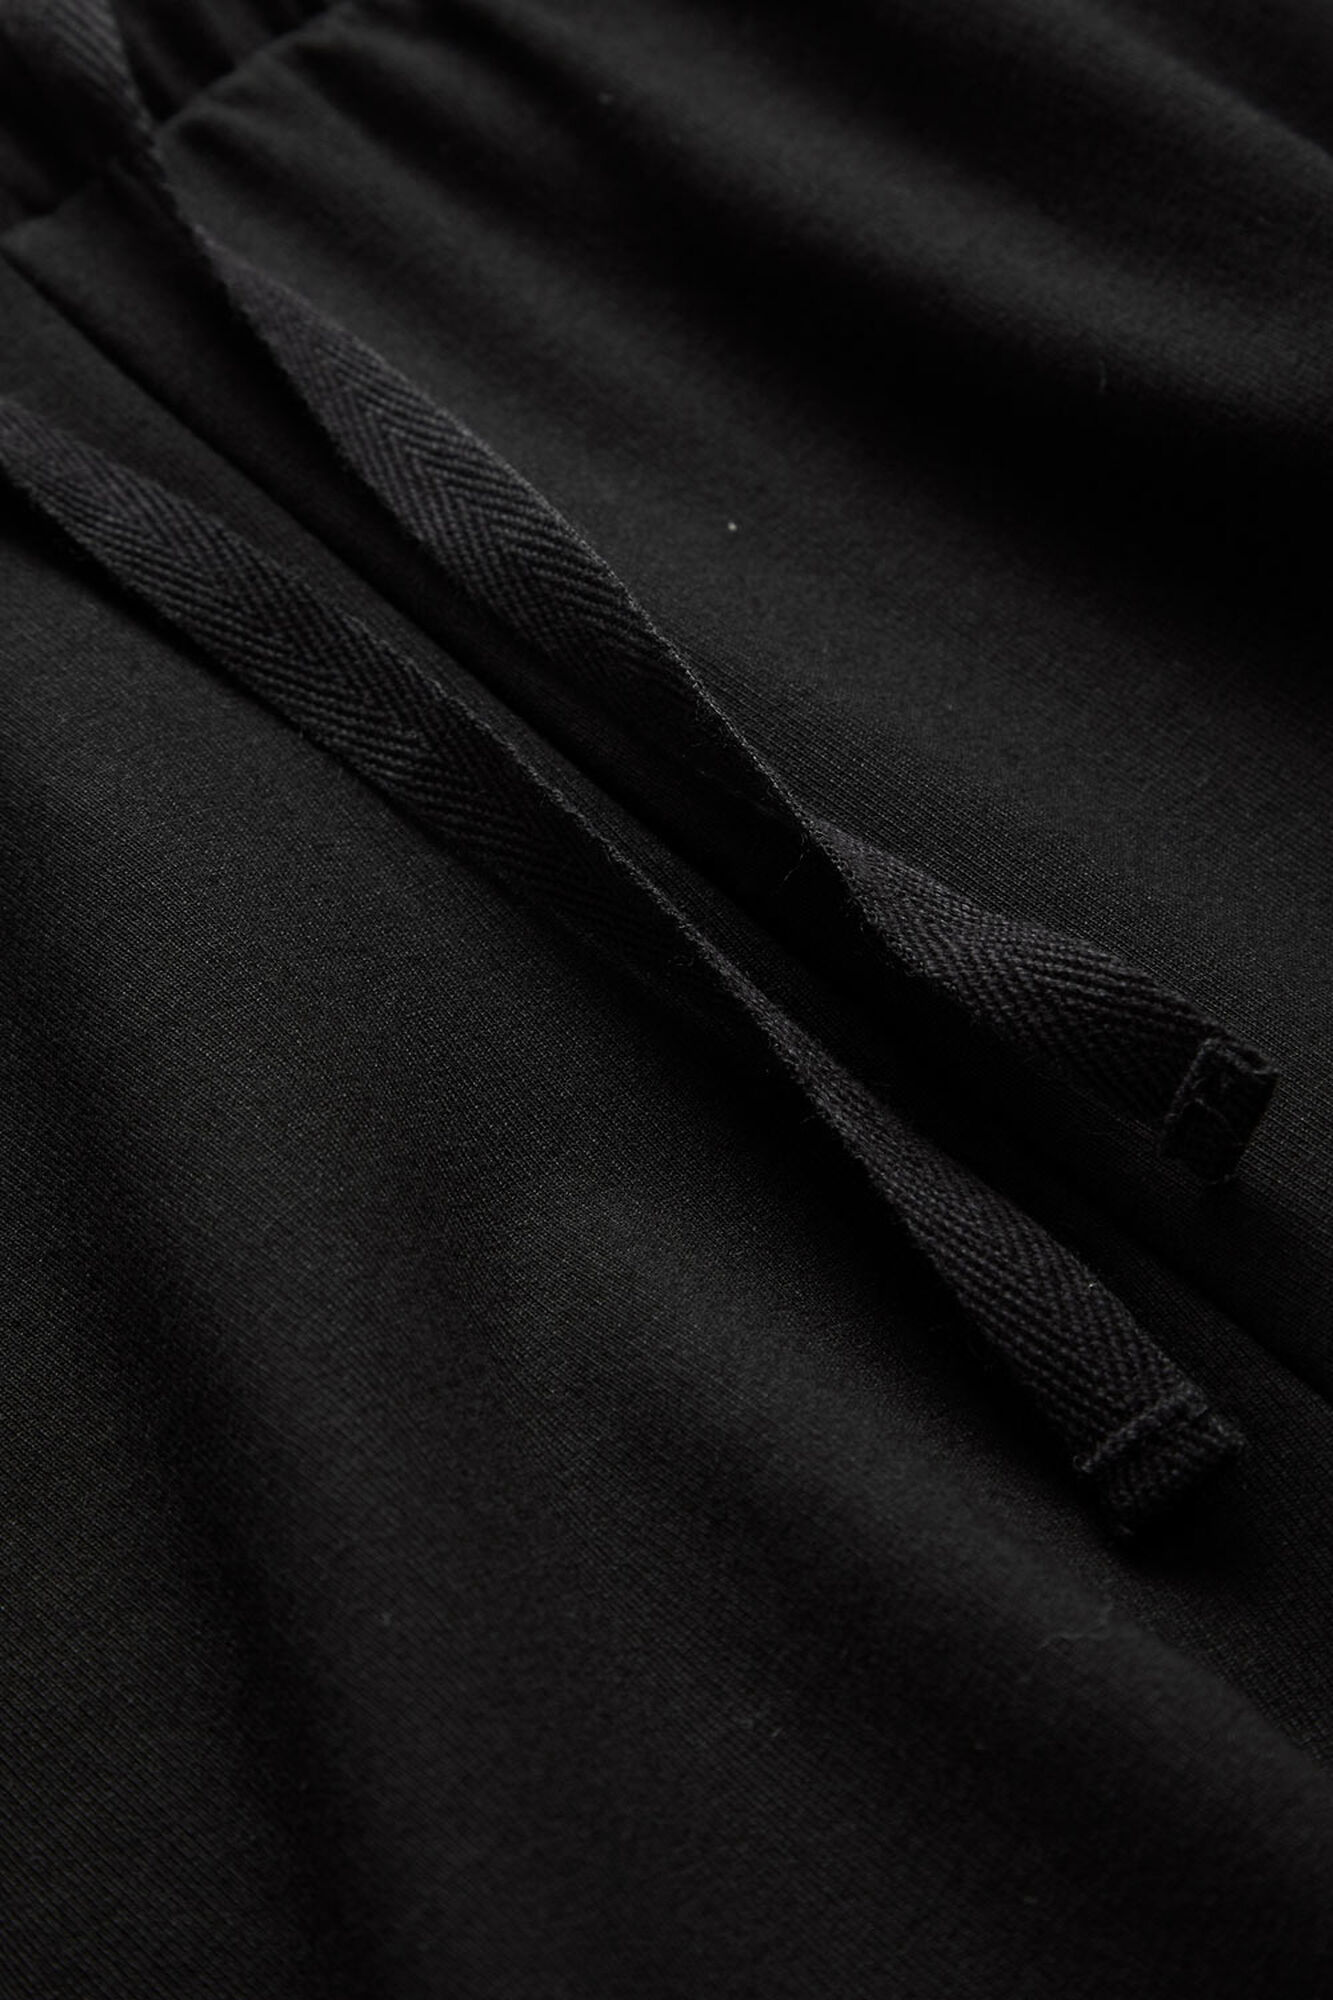 PETRASIA JERSEY TROUSERS, Black, hi-res